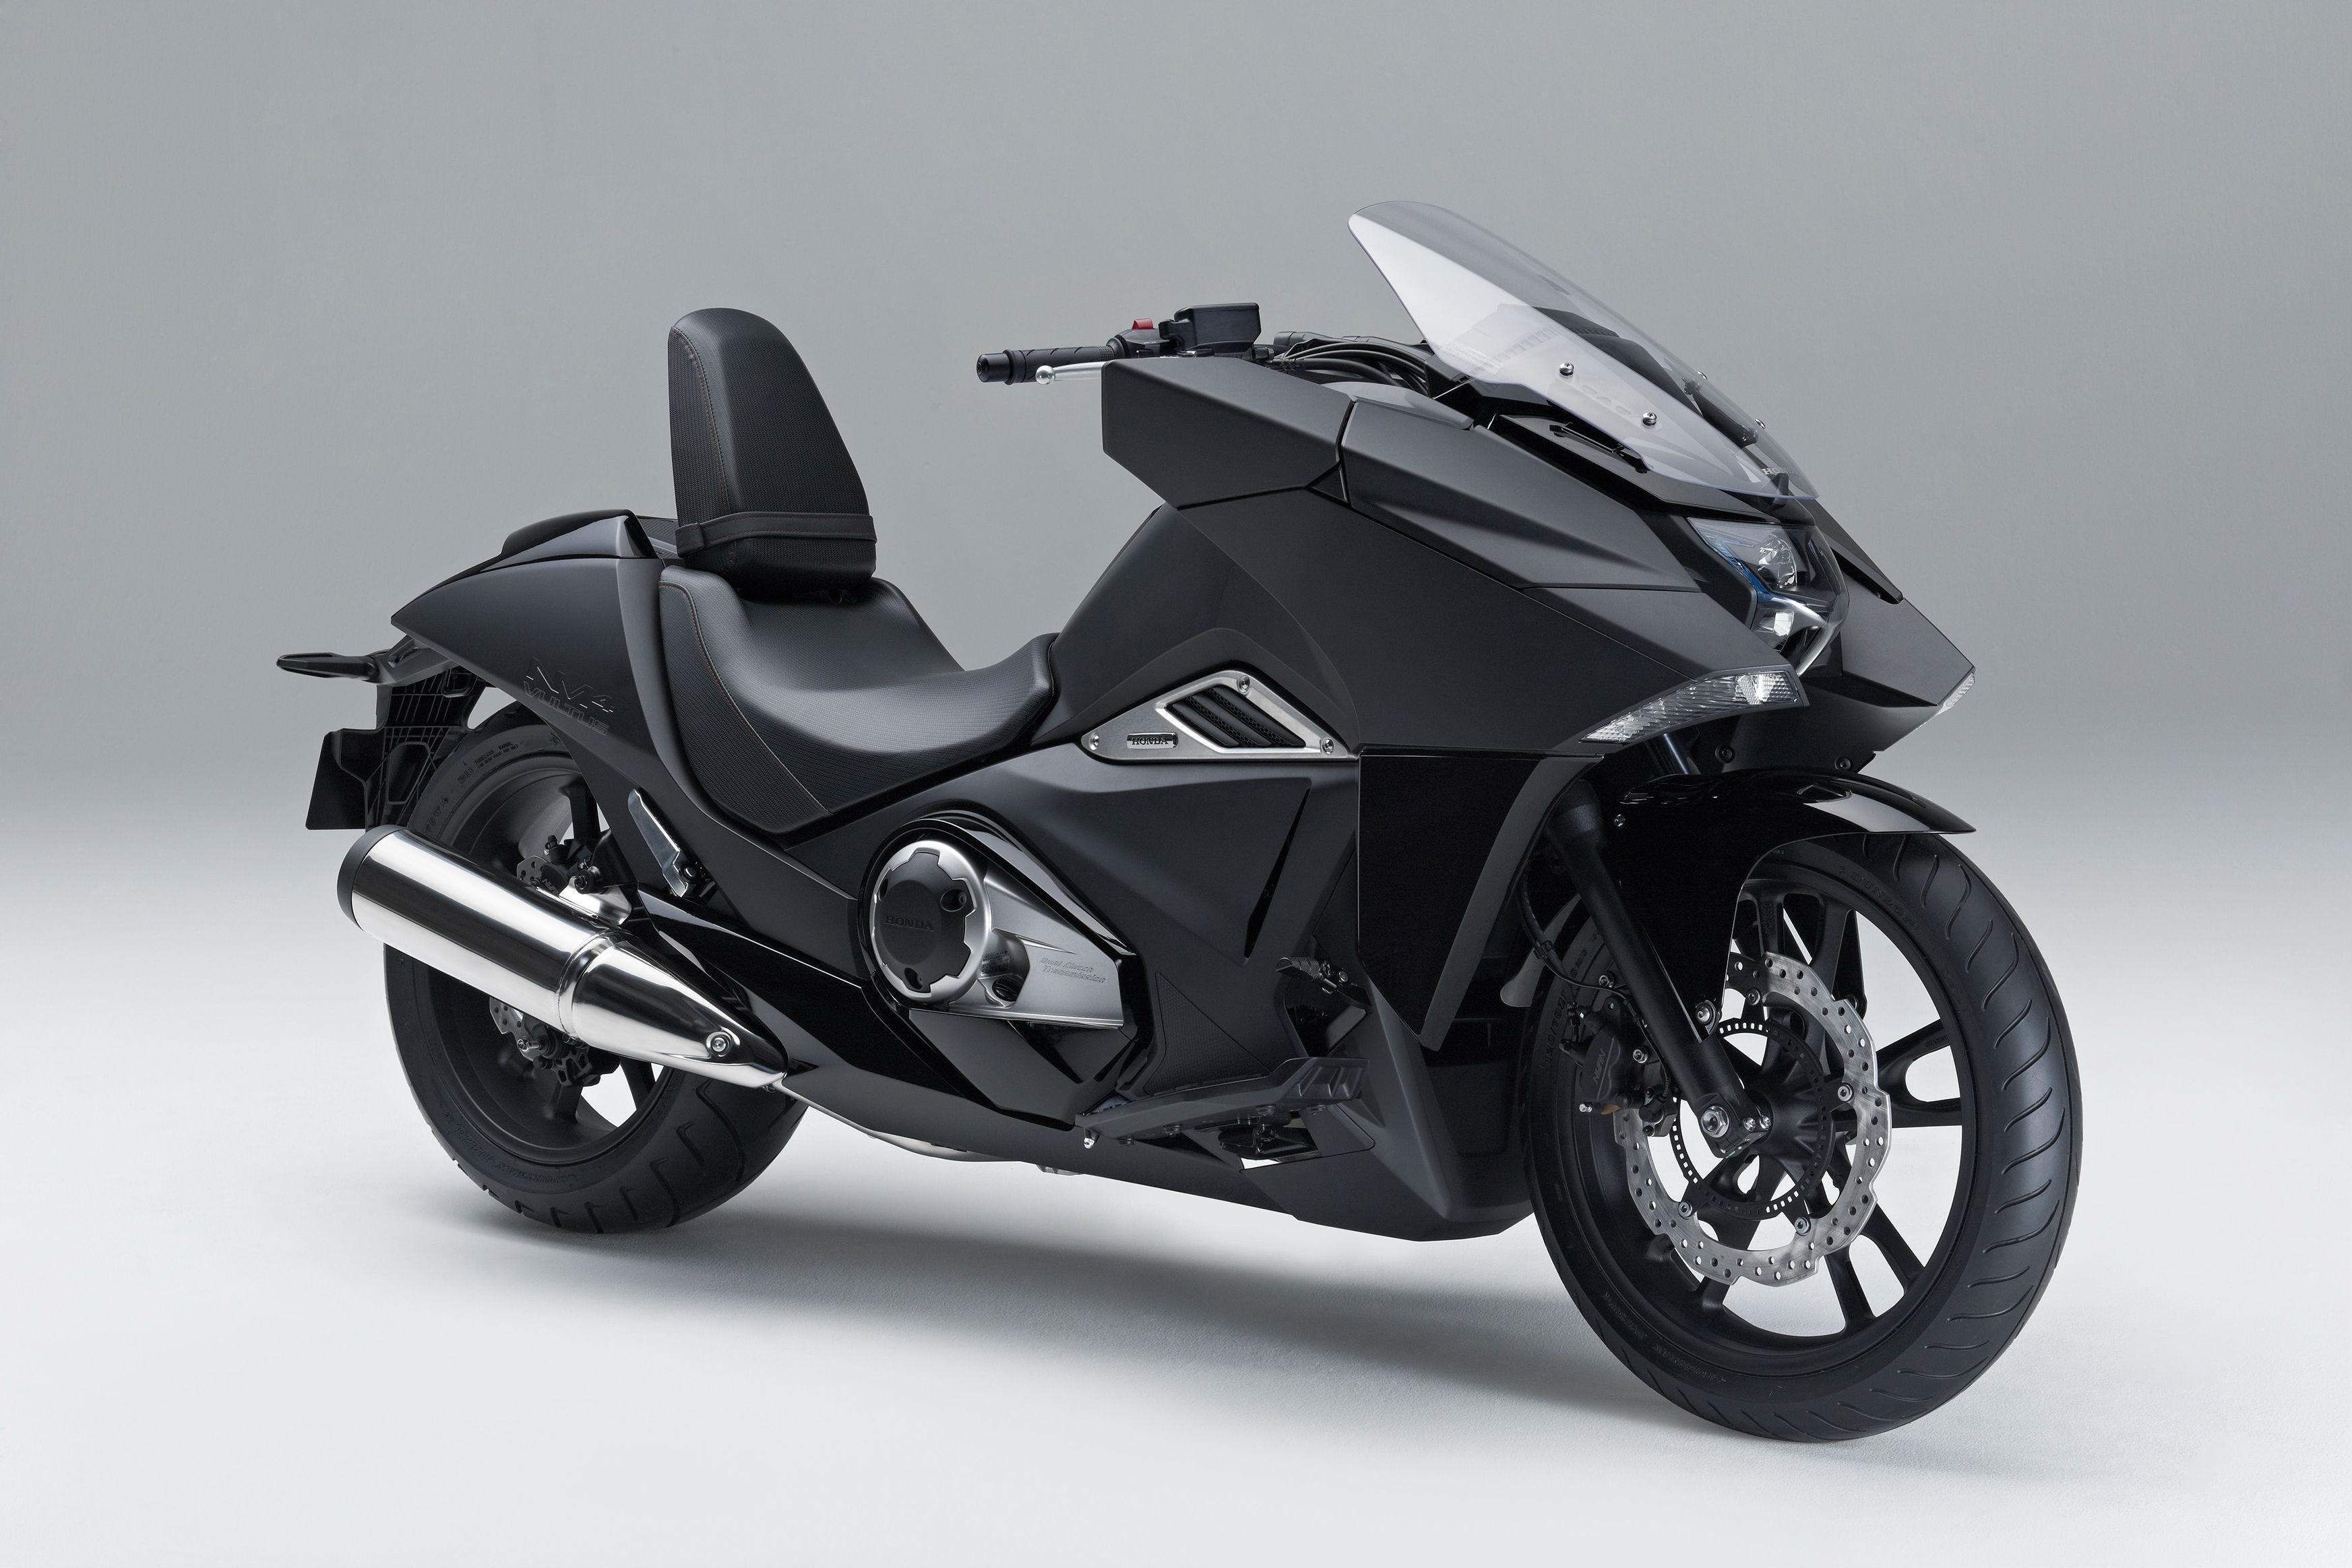 More Honda CB500 derivatives expected